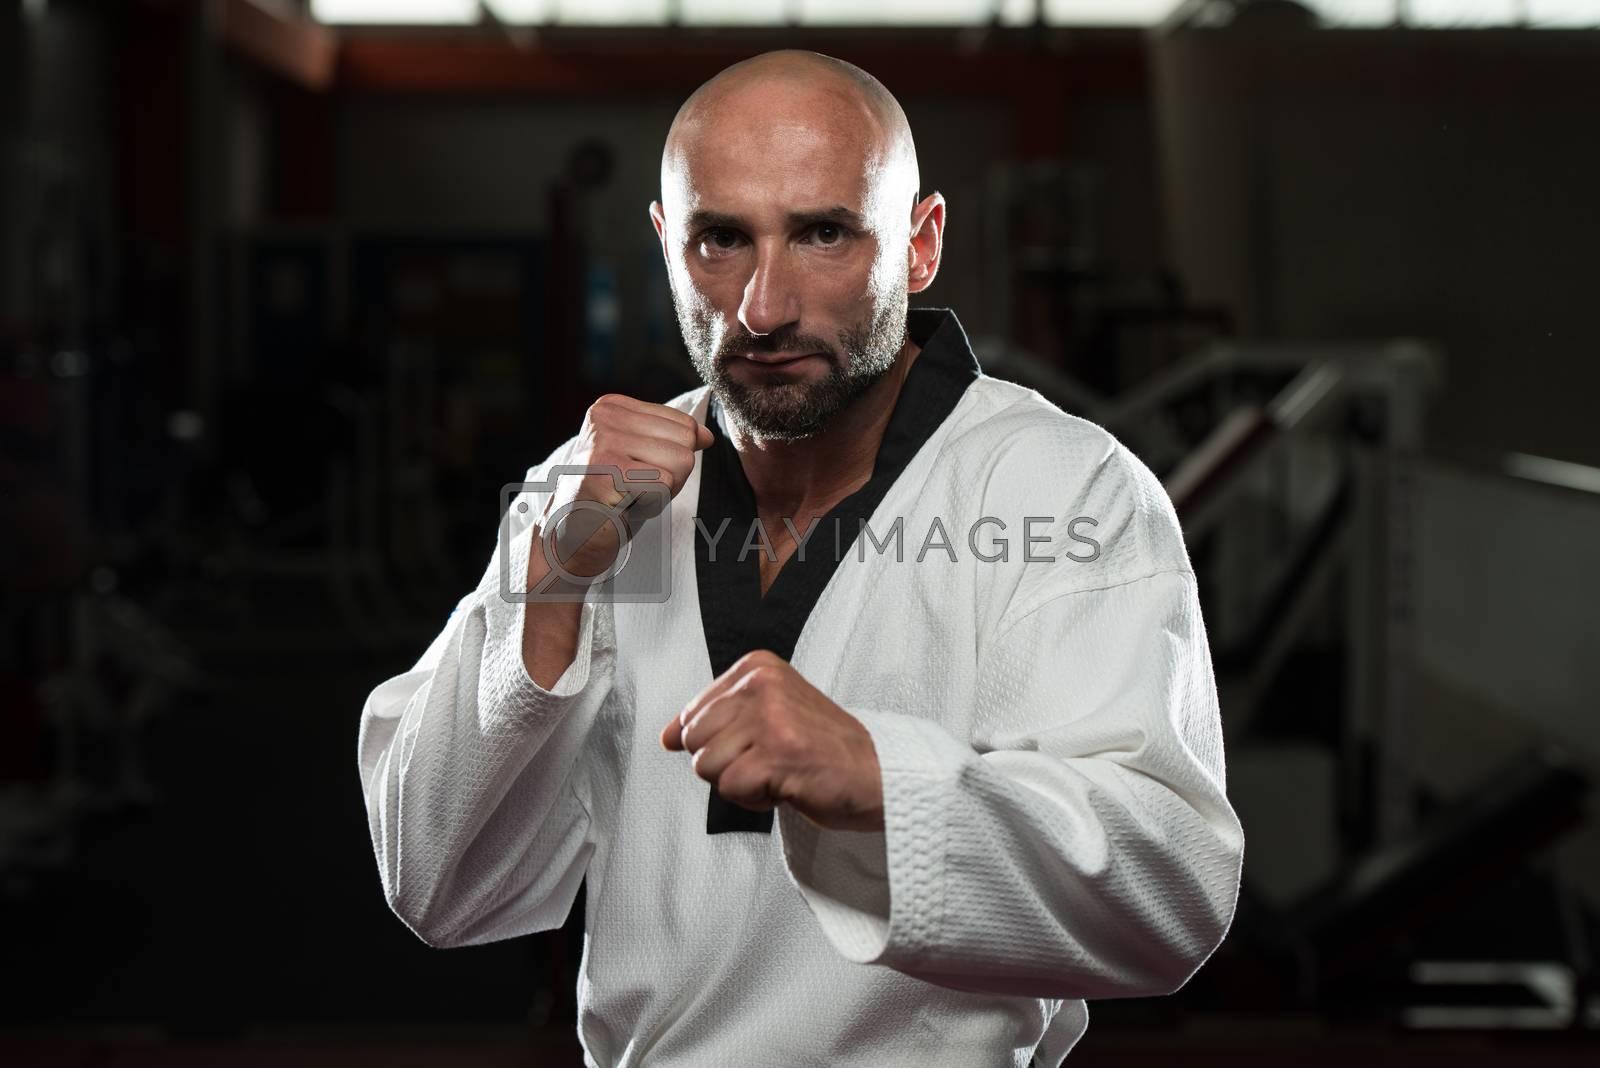 Mature Man Practicing His Karate Moves